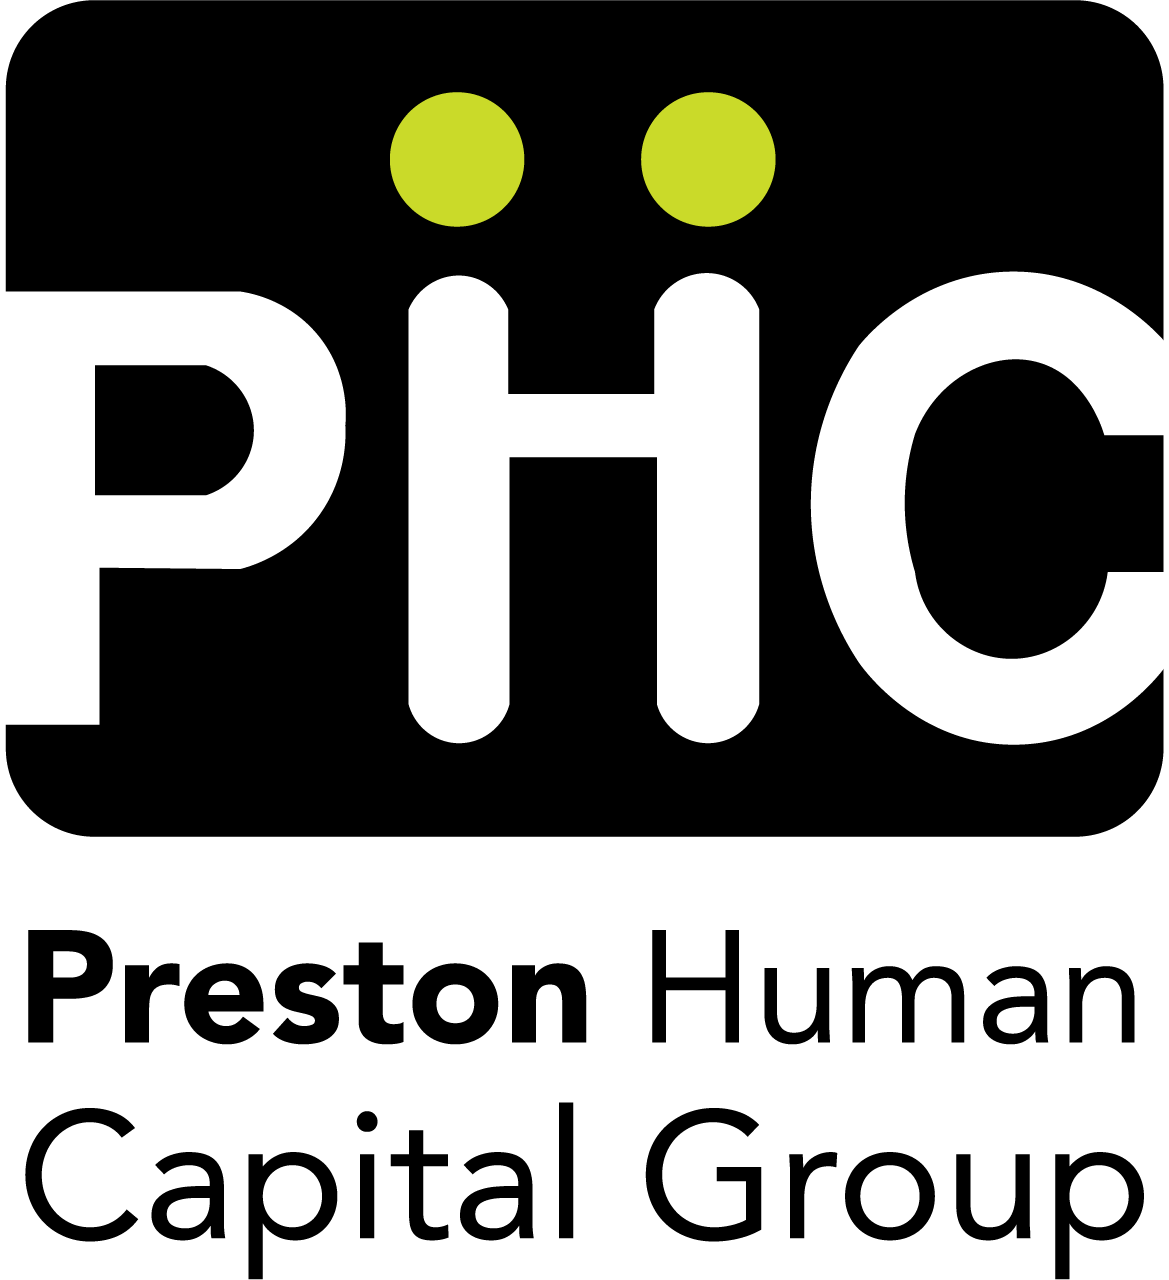 Preston Human Capital Group